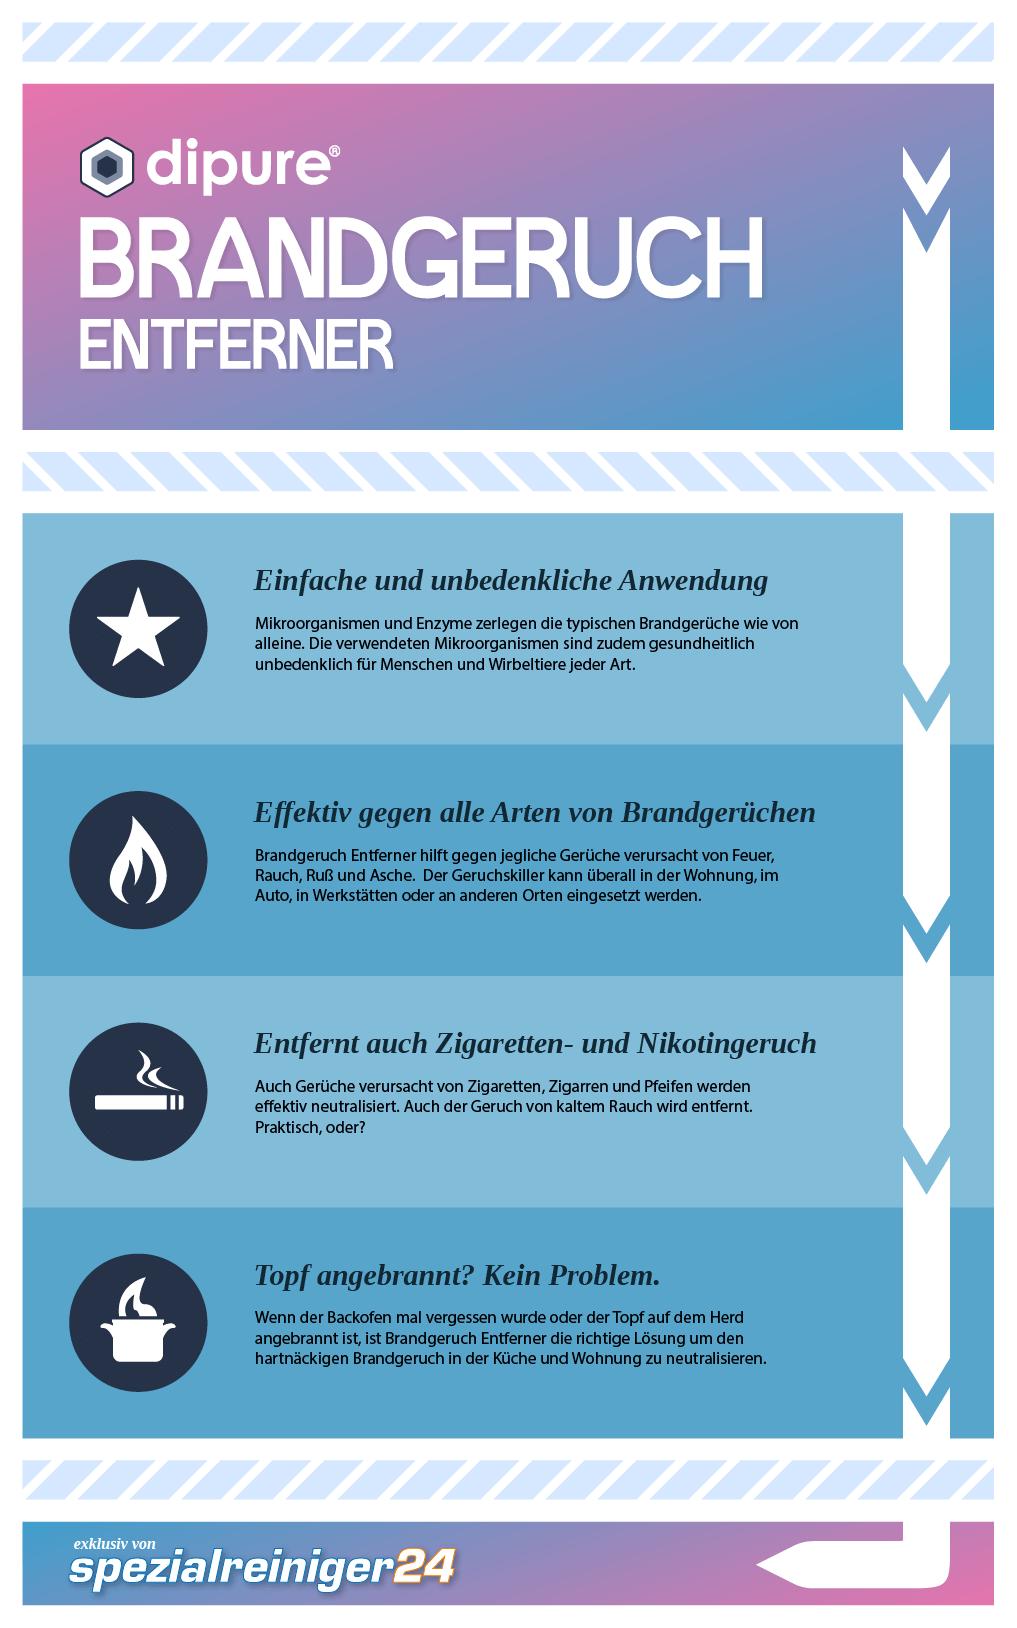 Brandgeruch Entferner Infografik